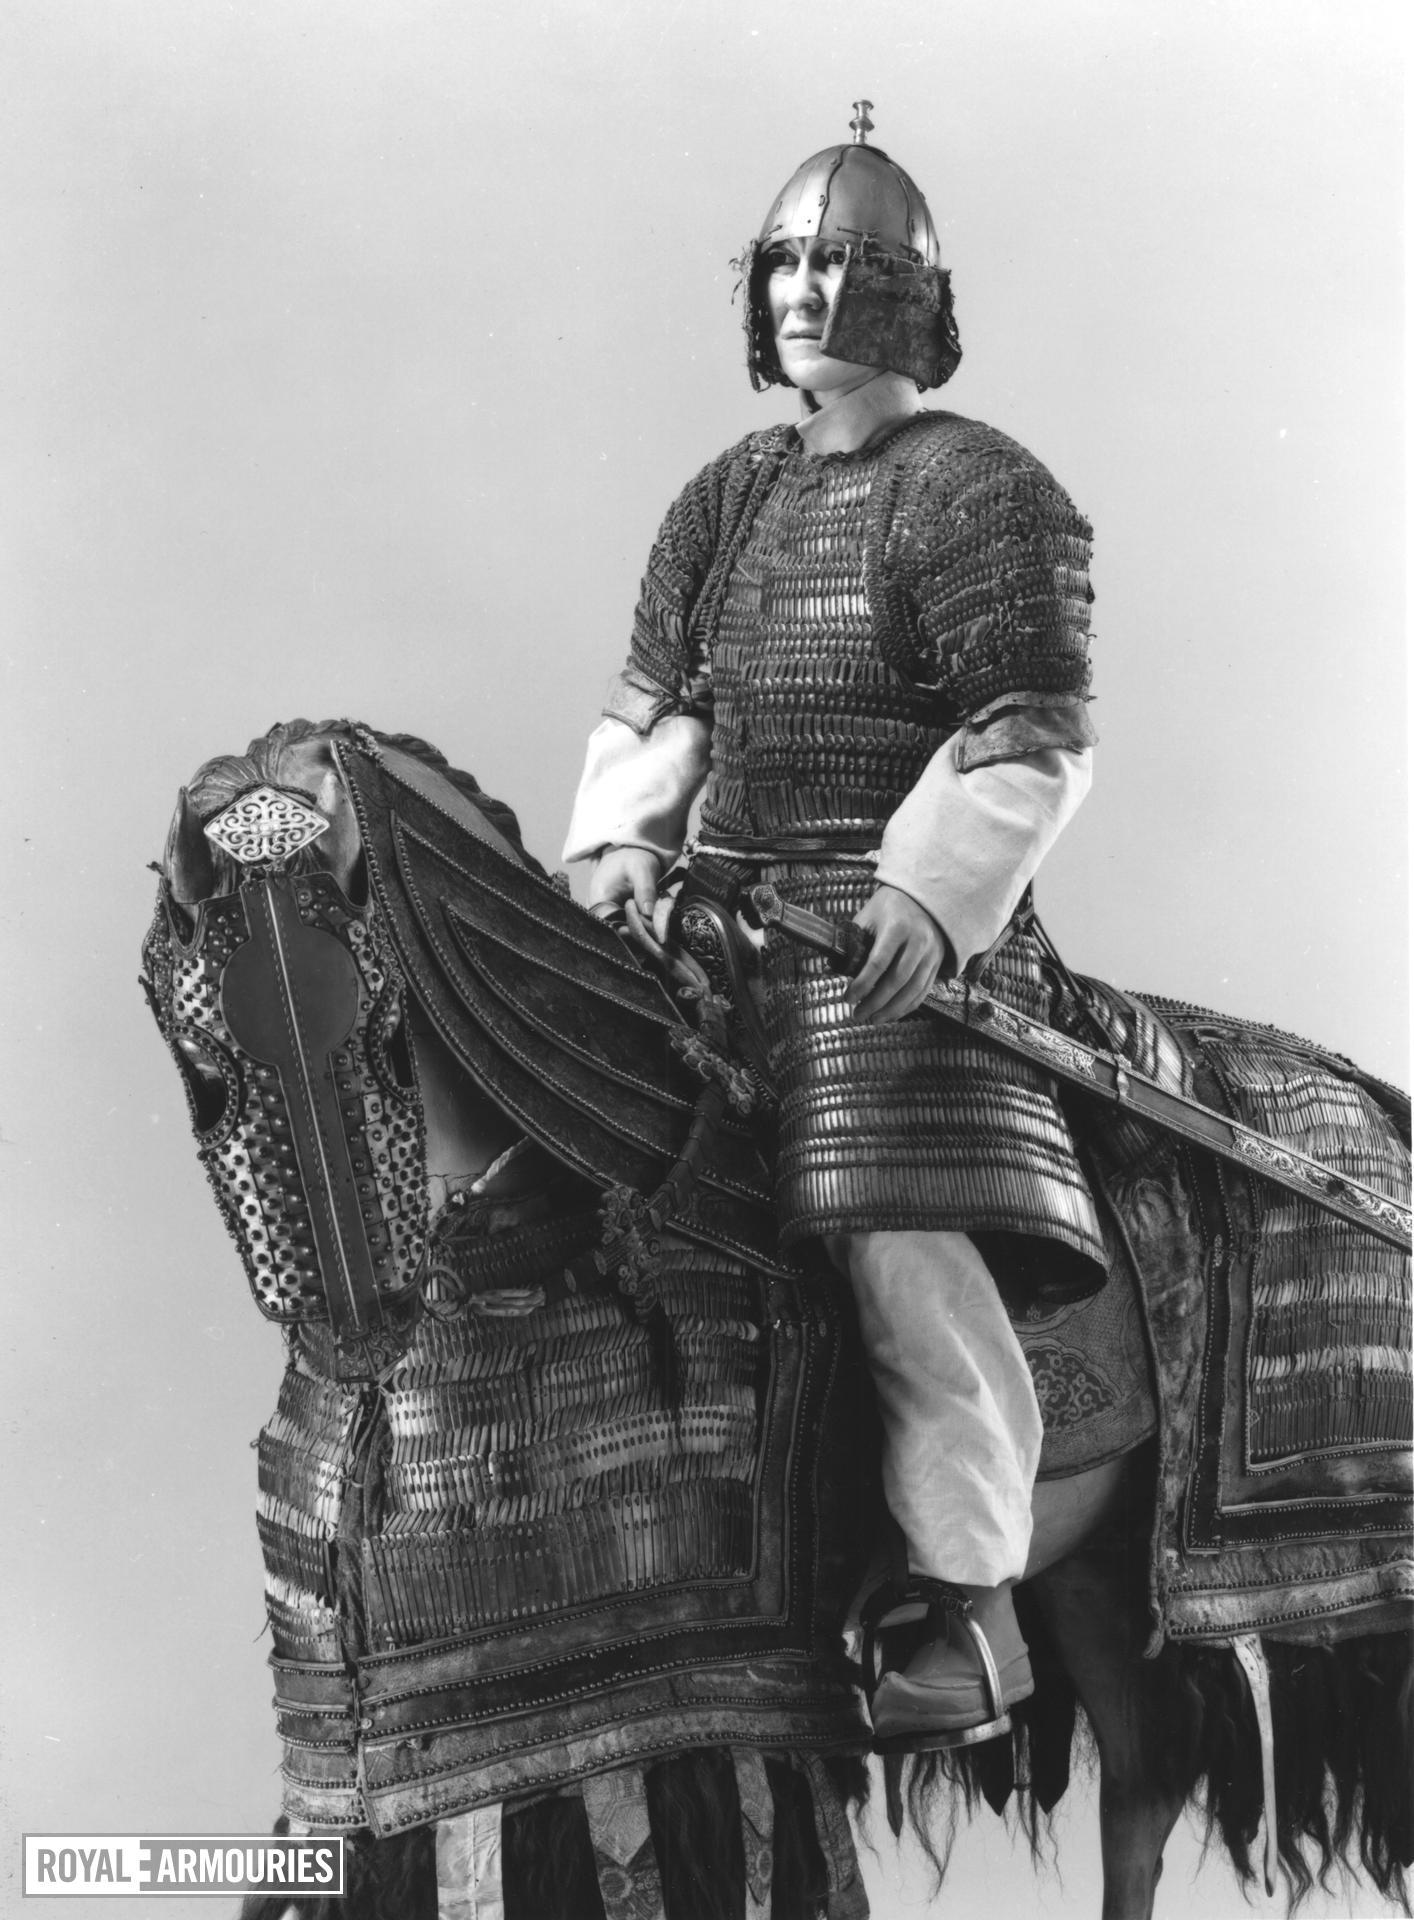 Sword (talwar)